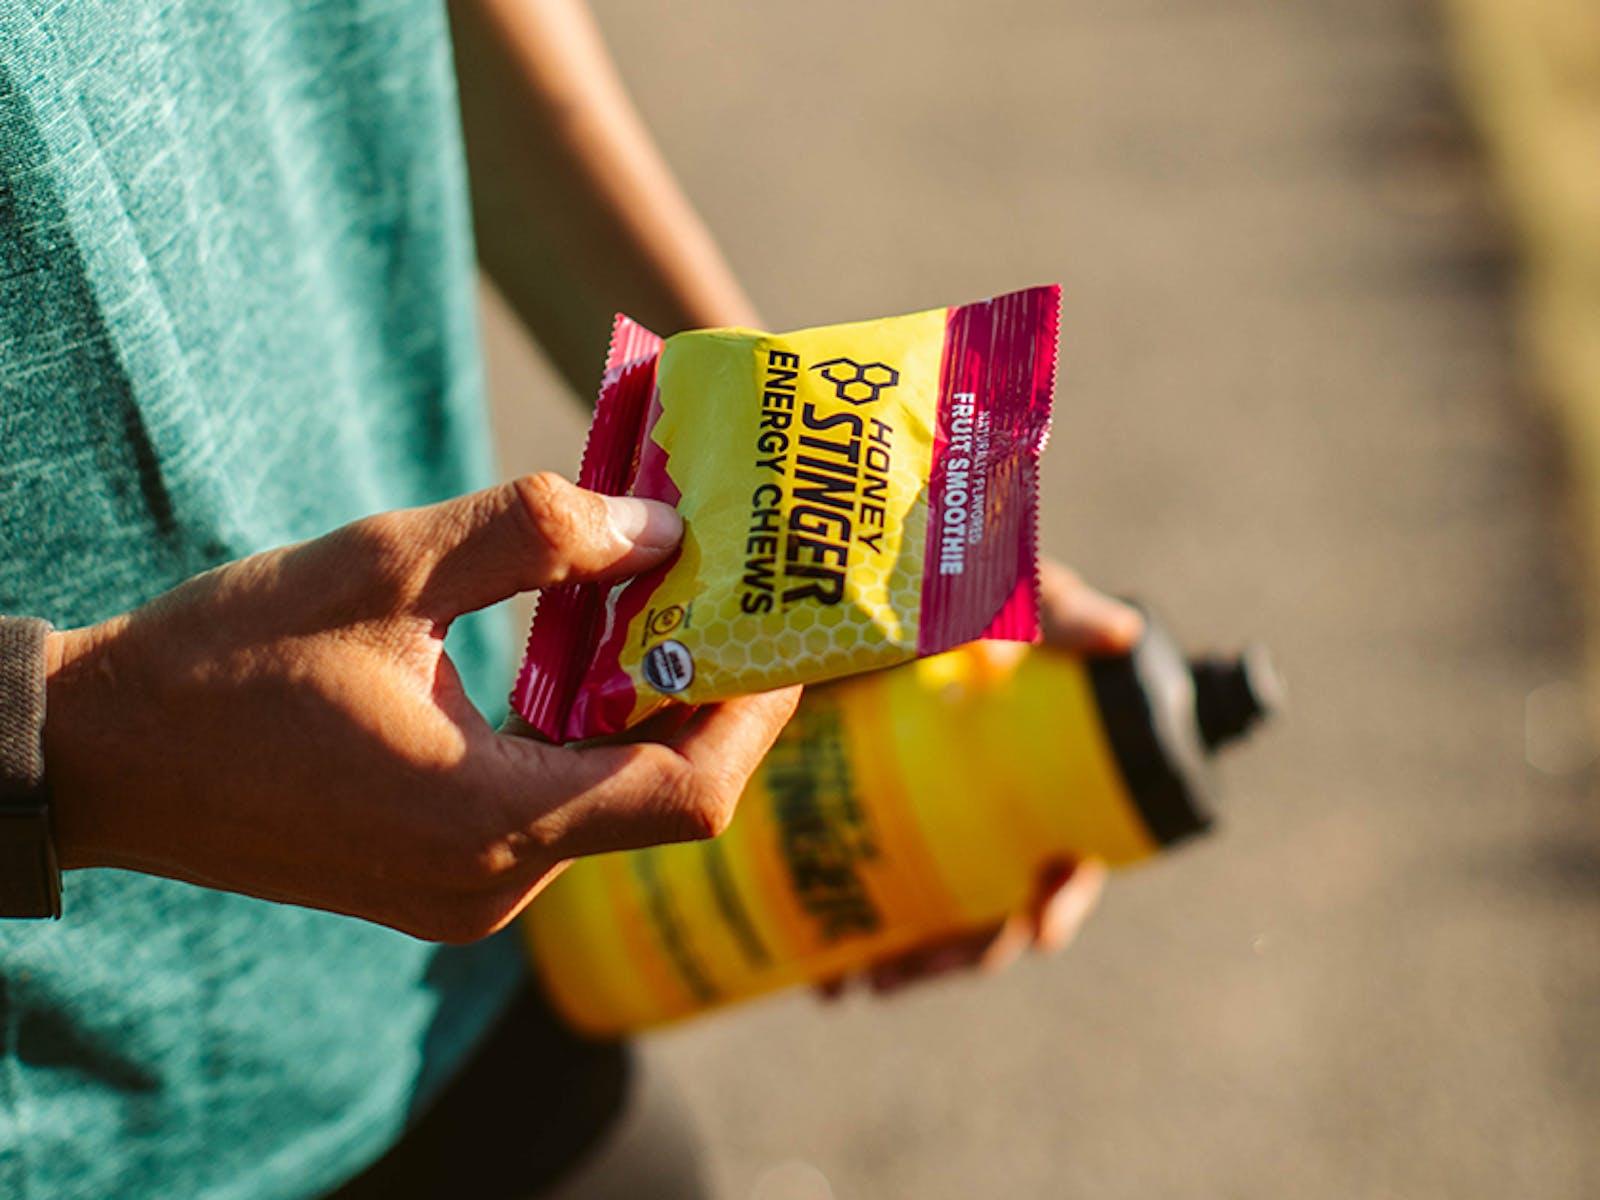 Holding Honey Stinger energy chews and wattle bottle